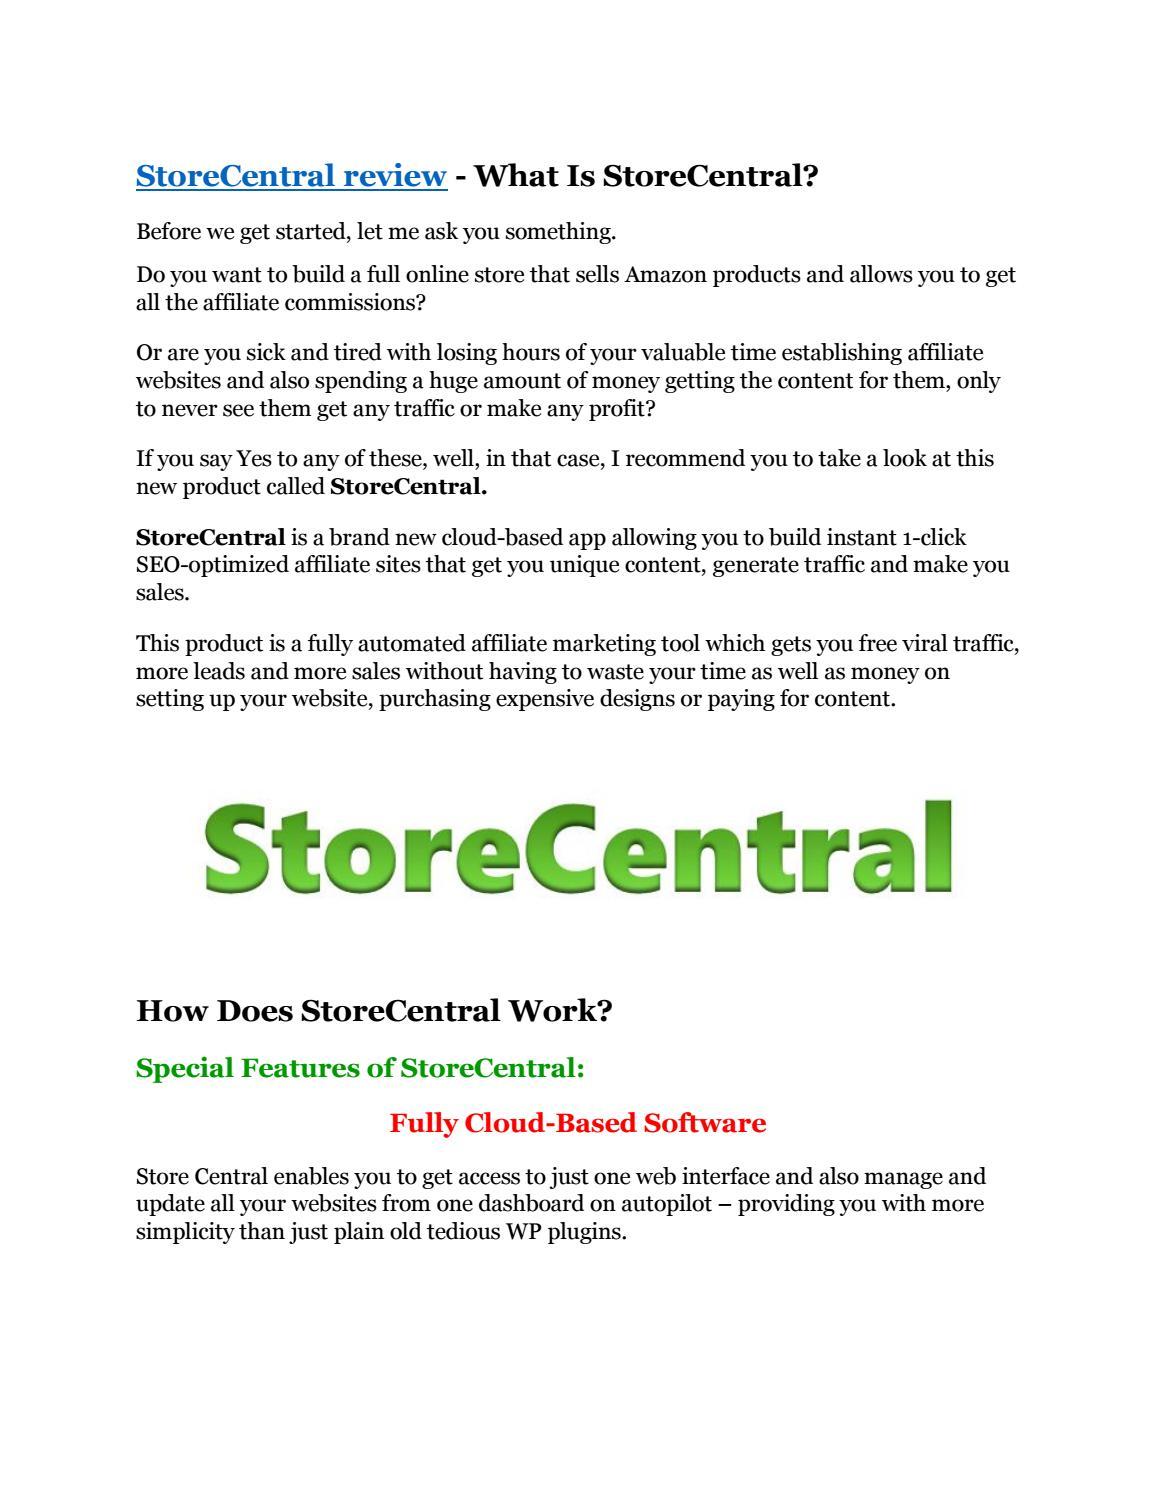 StoreCentral Review & GIANT bonus packs by cikinoke - issuu